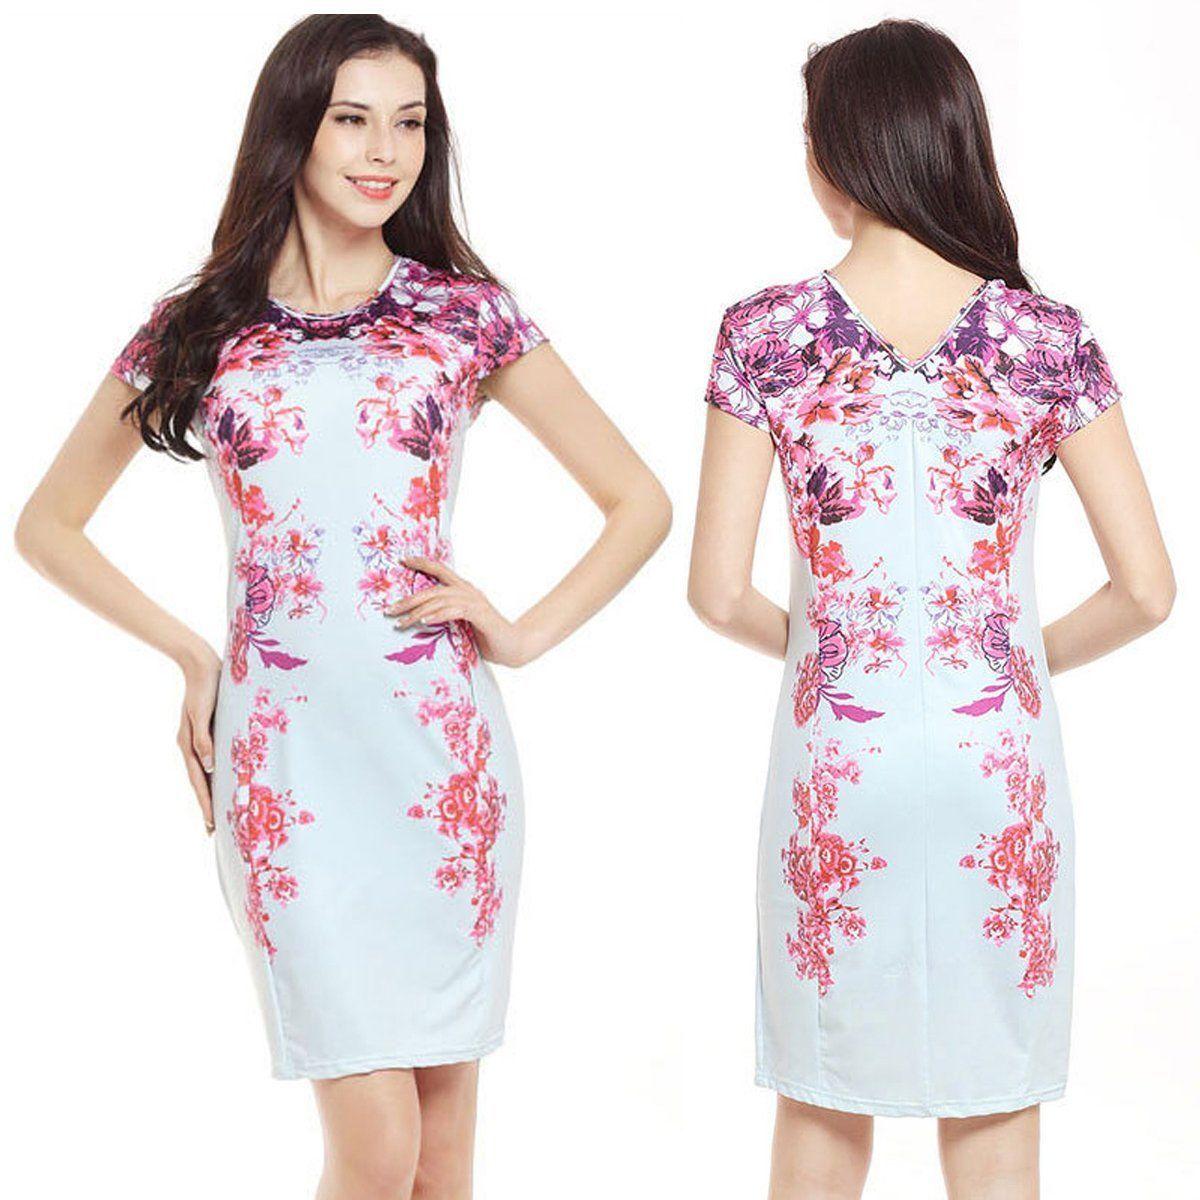 54d7fbafbef36 $9.35 - Women Summer Bandage Bodycon Slim Evening Party Cocktail Floral Short  Mini Dress #ebay #Fashion